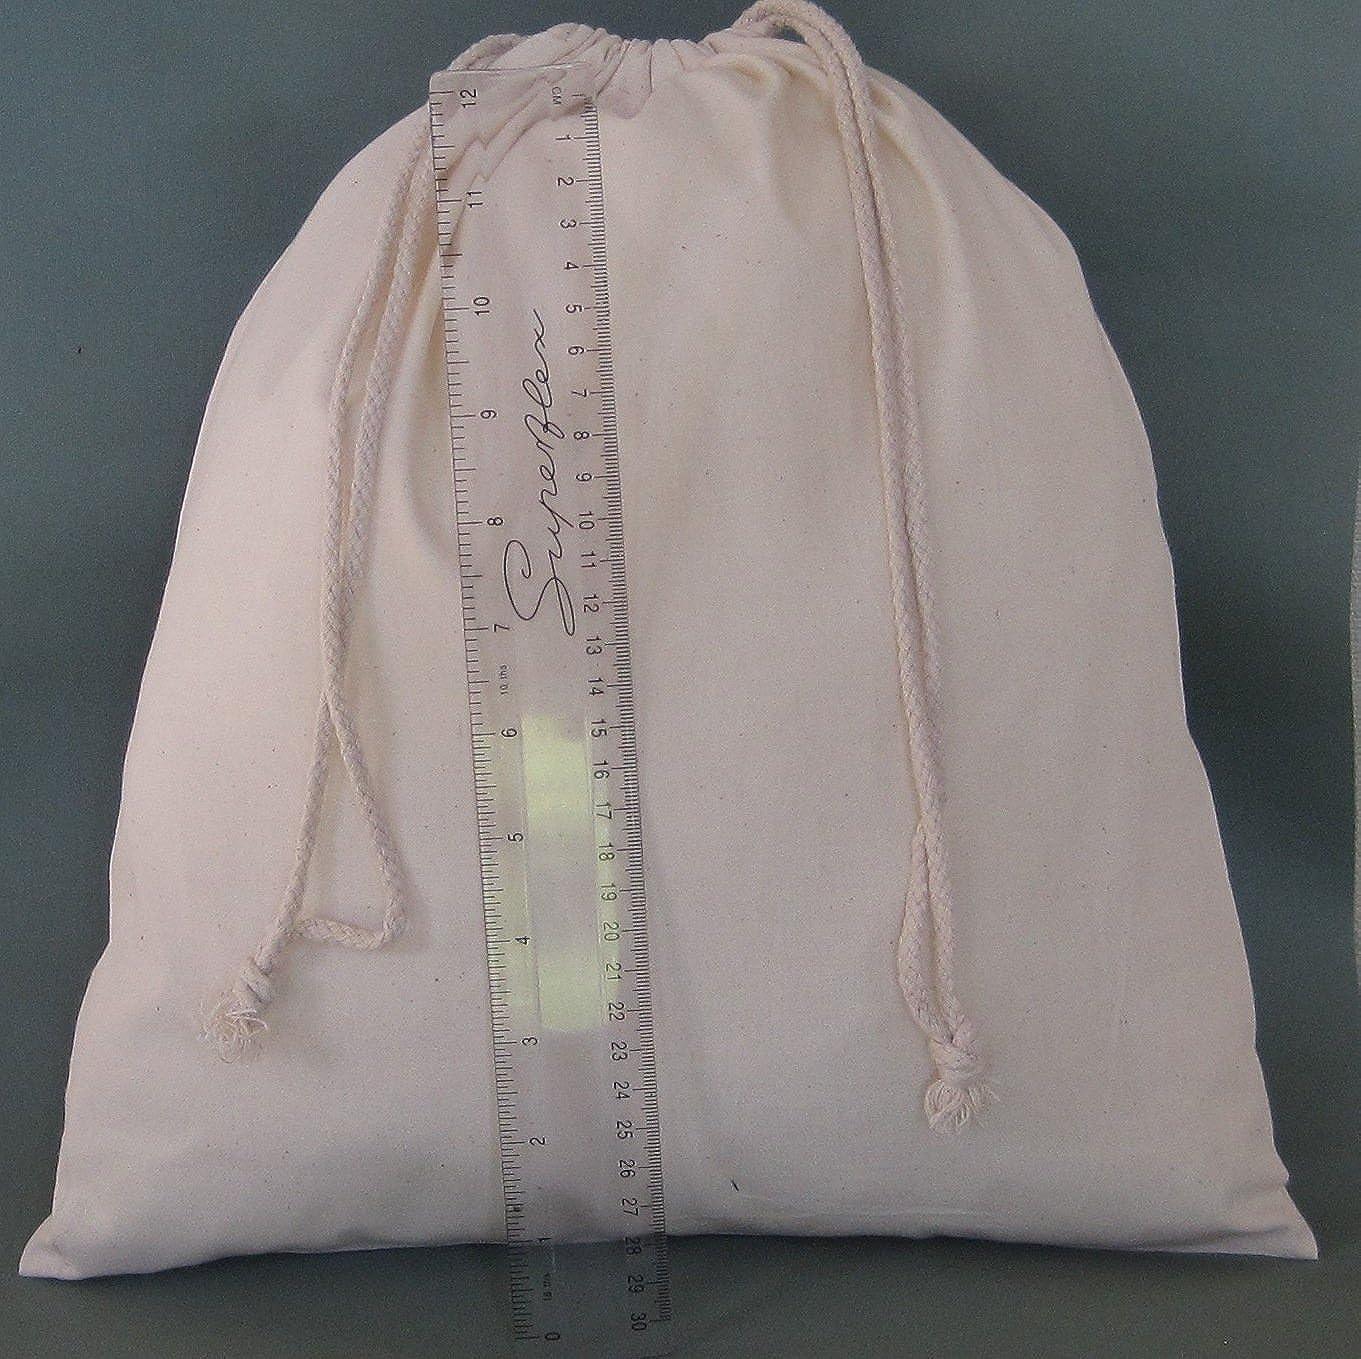 x 40 cm H Small Size 100/% Cotton 4 PACK Travel Bag Set 35 W